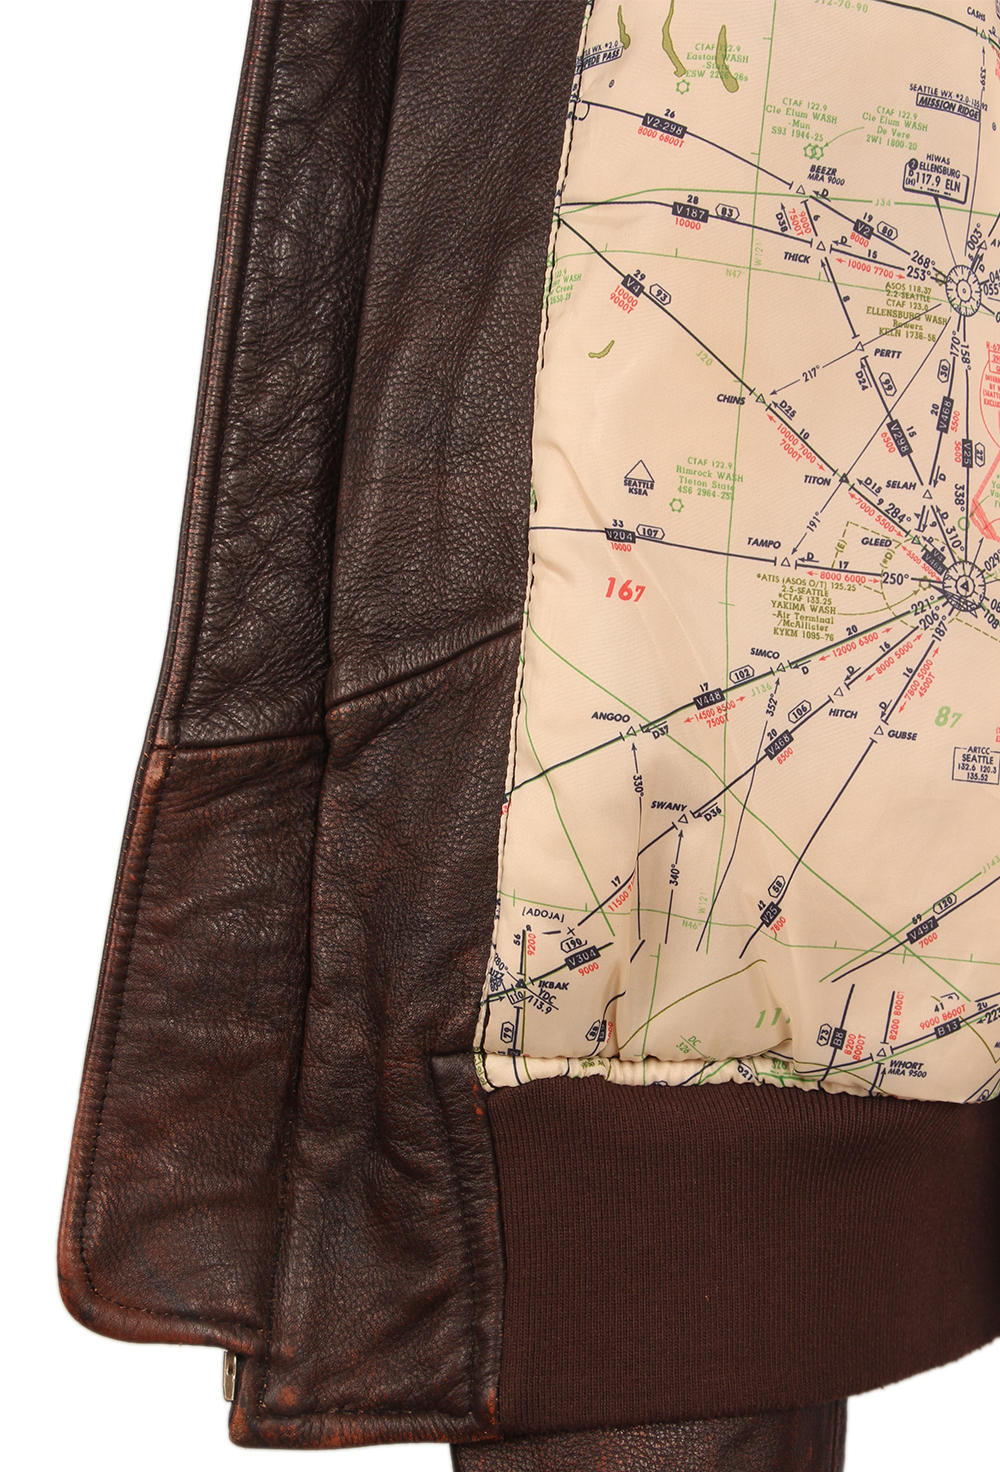 H90c60cc553aa40e1b0be75fc83f19831T Vintage Distressed Men Leather Jacket Quilted Fur Collar 100% Calfskin Flight Jacket Men's Leather Jacket Man Winter Coat M253